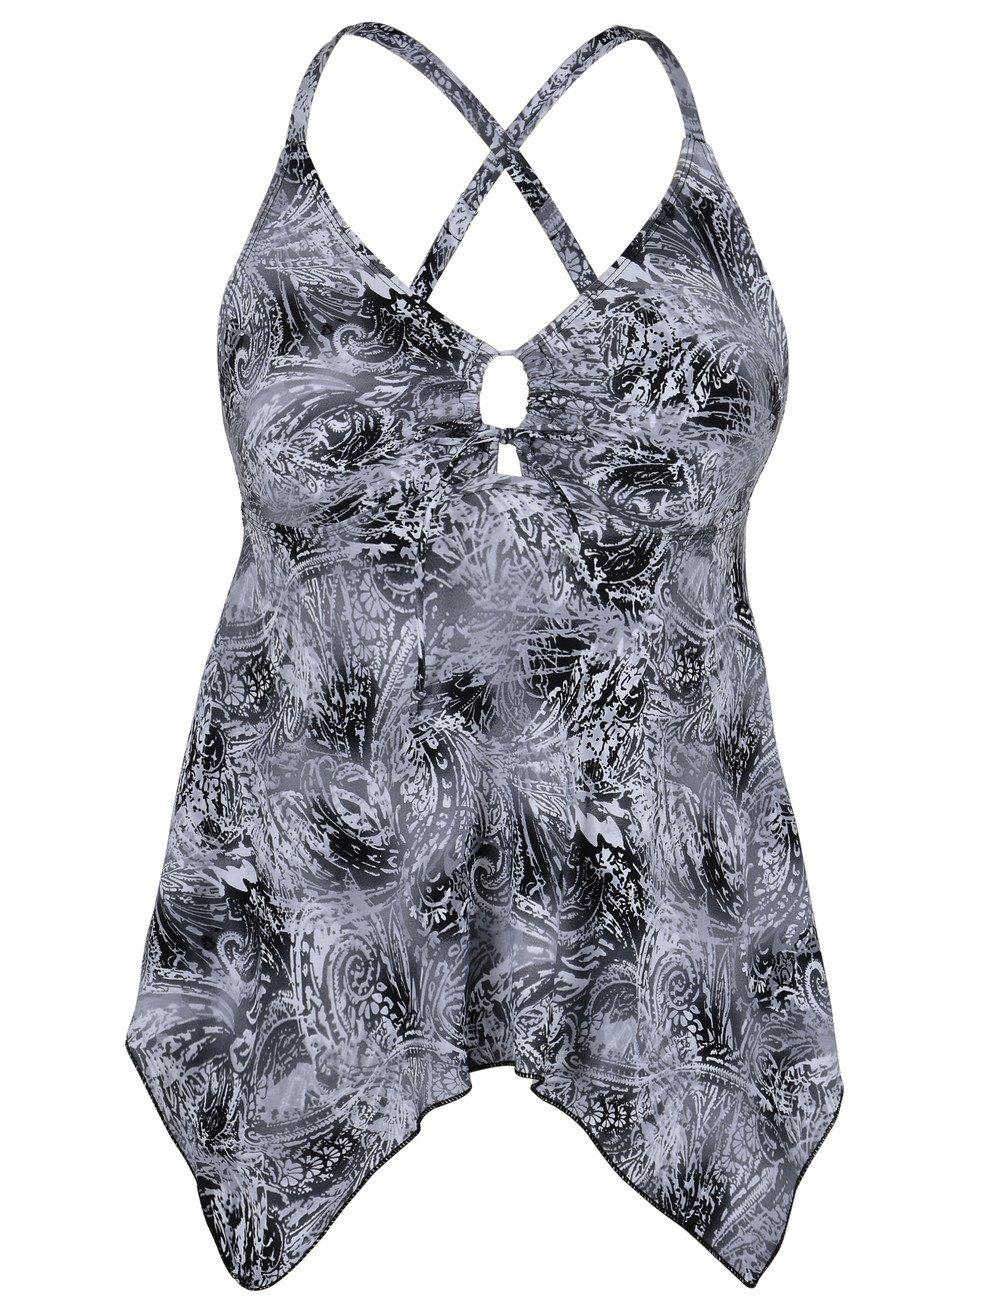 Hilor SWIMWEAR レディース B075RW3JVT 16|Grey&black